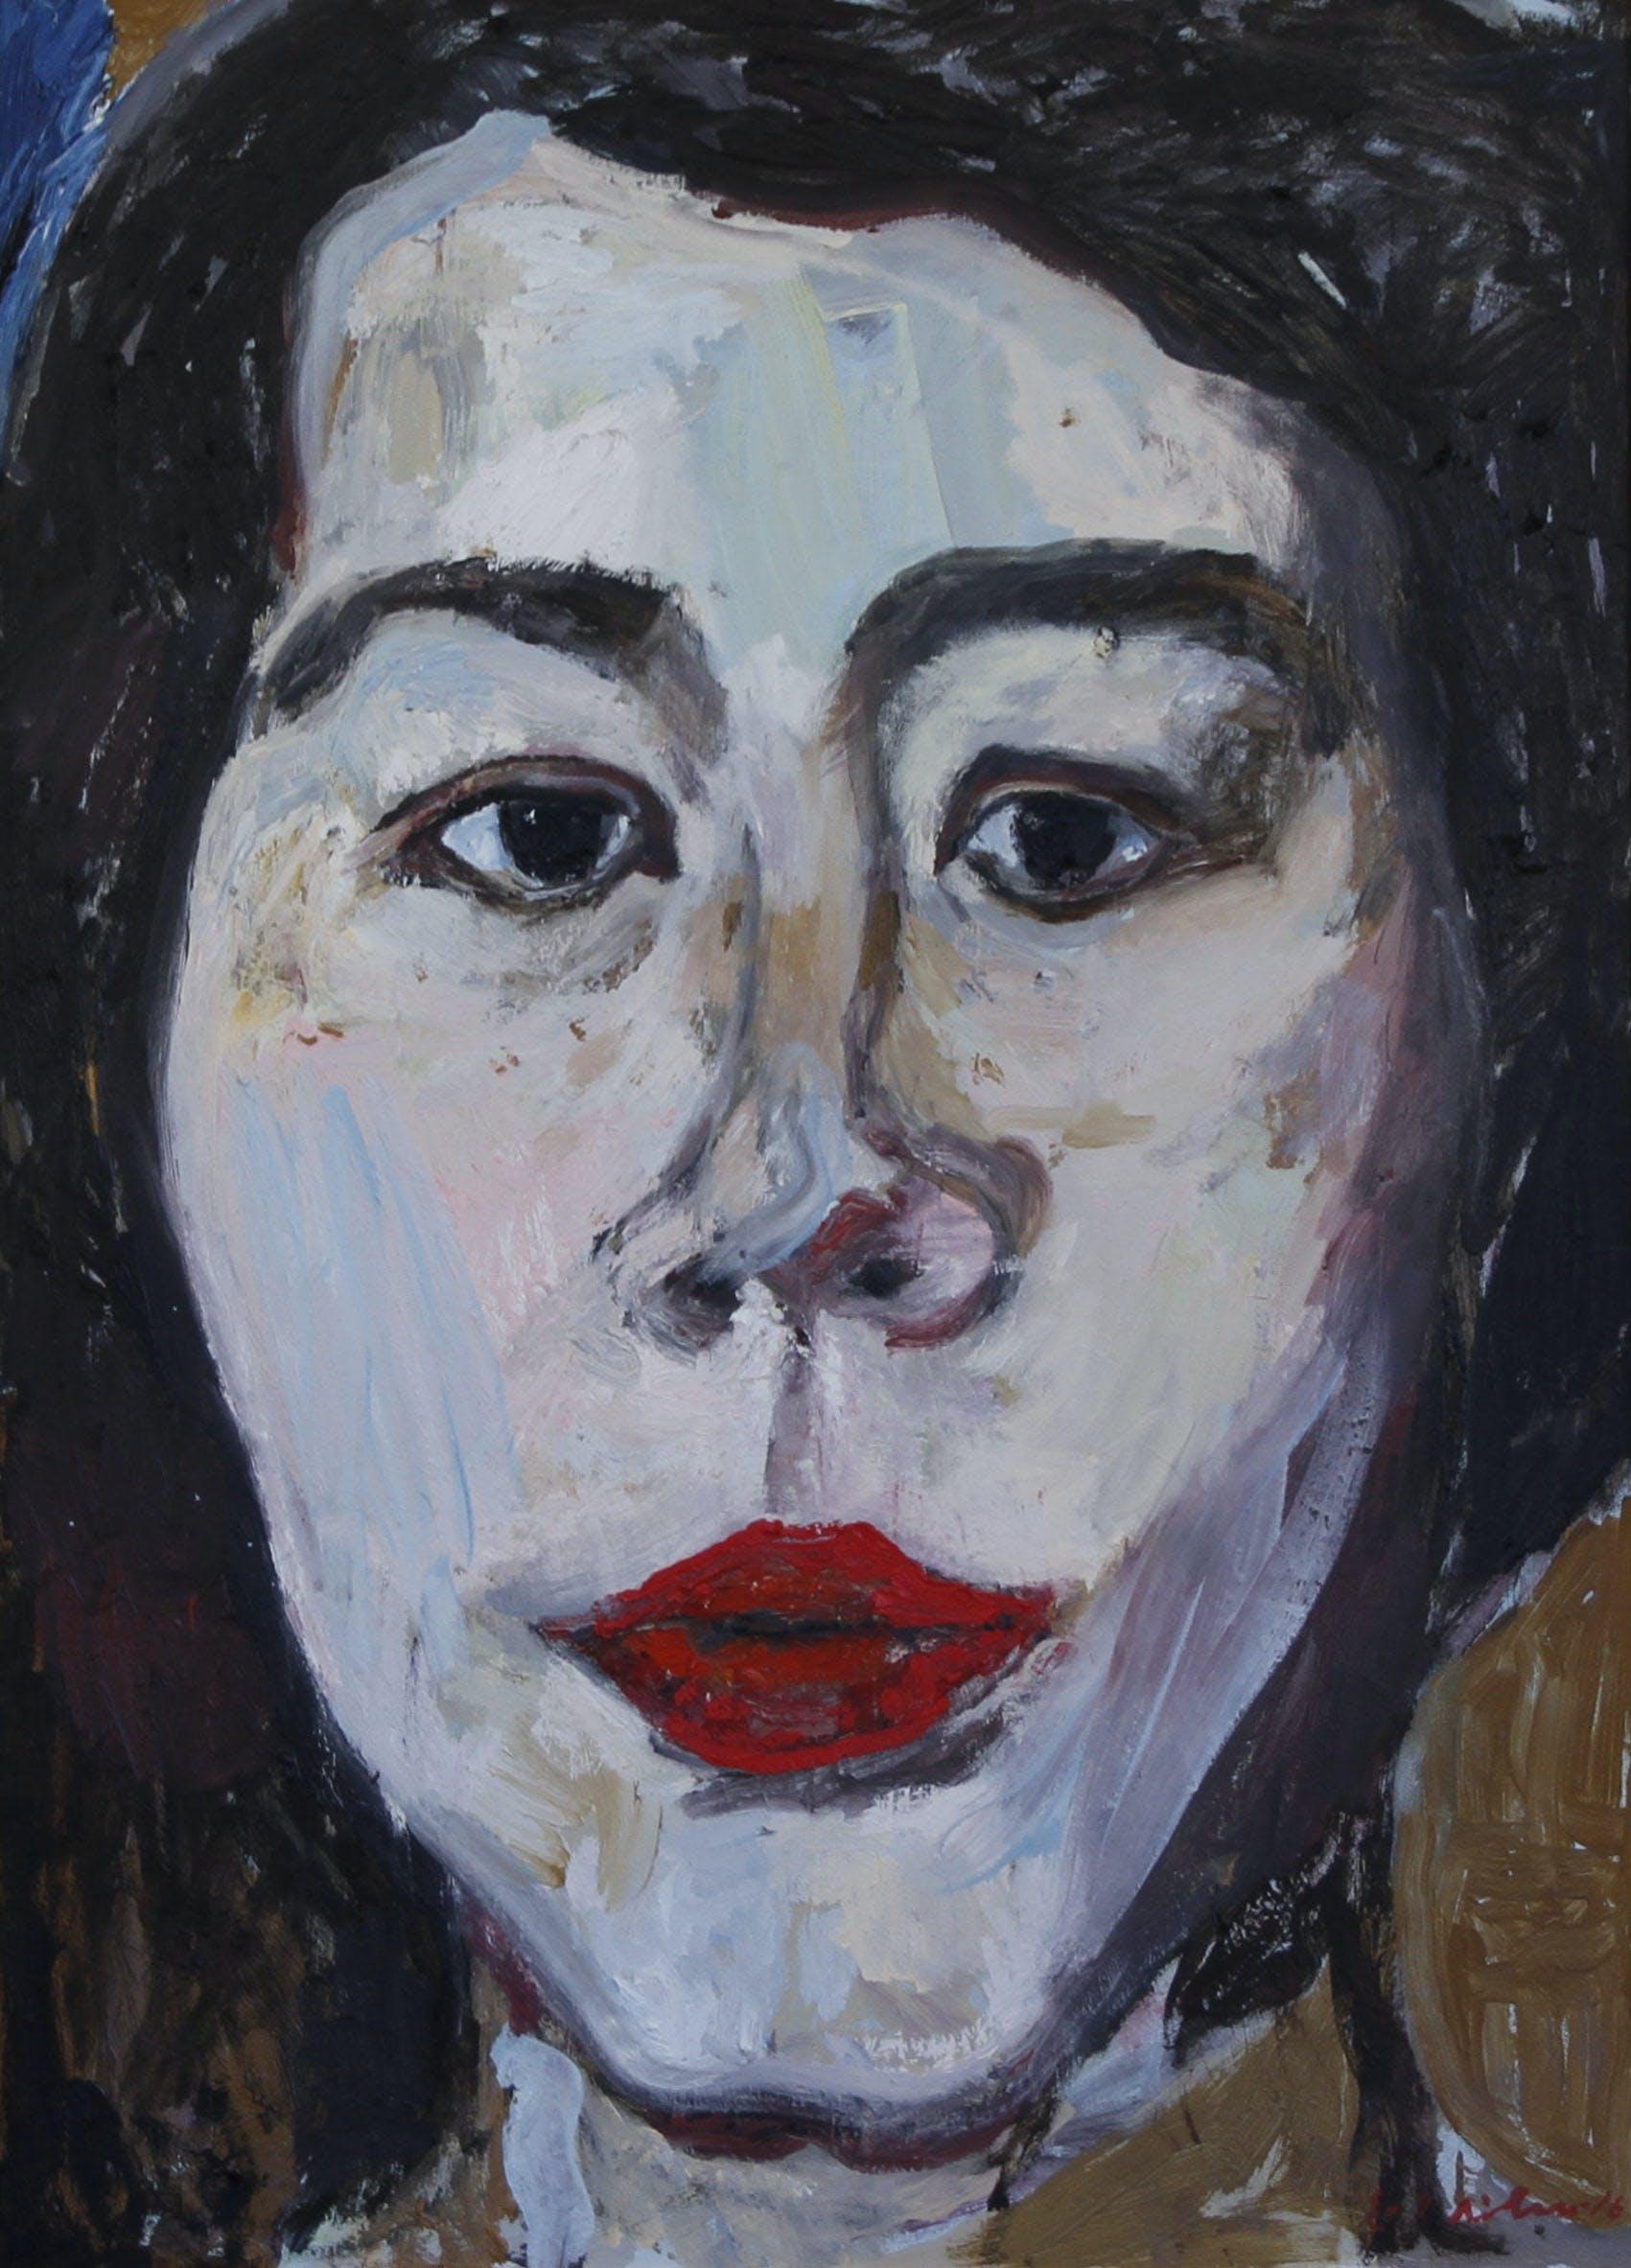 Ann, 100cm x 57cm, öljy/tempera, 2018